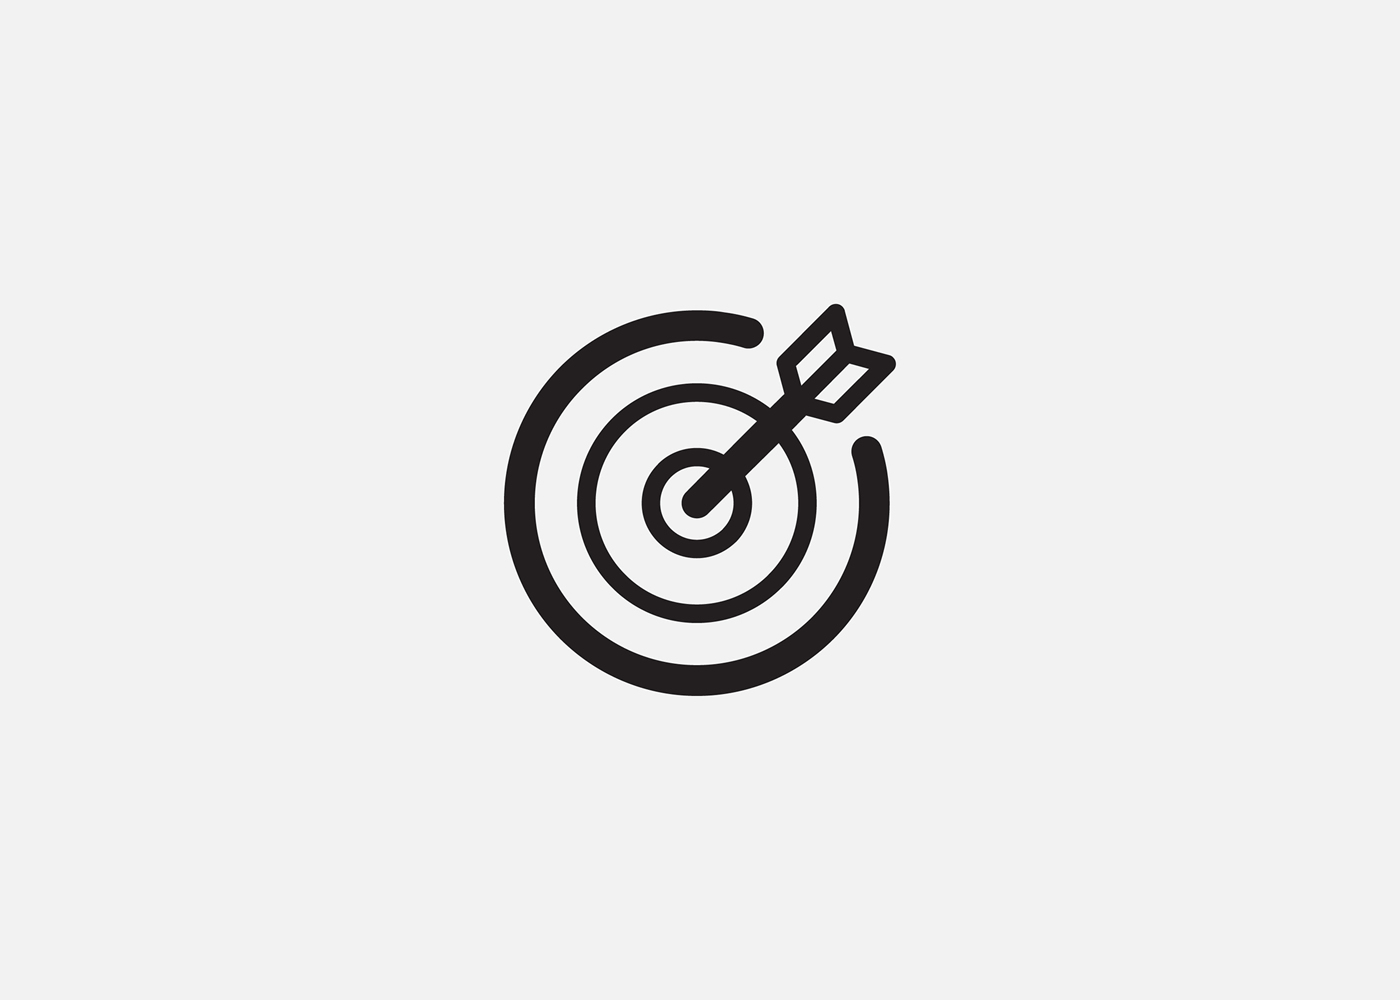 naem-research-quickpolls-2018-08-sustainability-goals-2100x1500